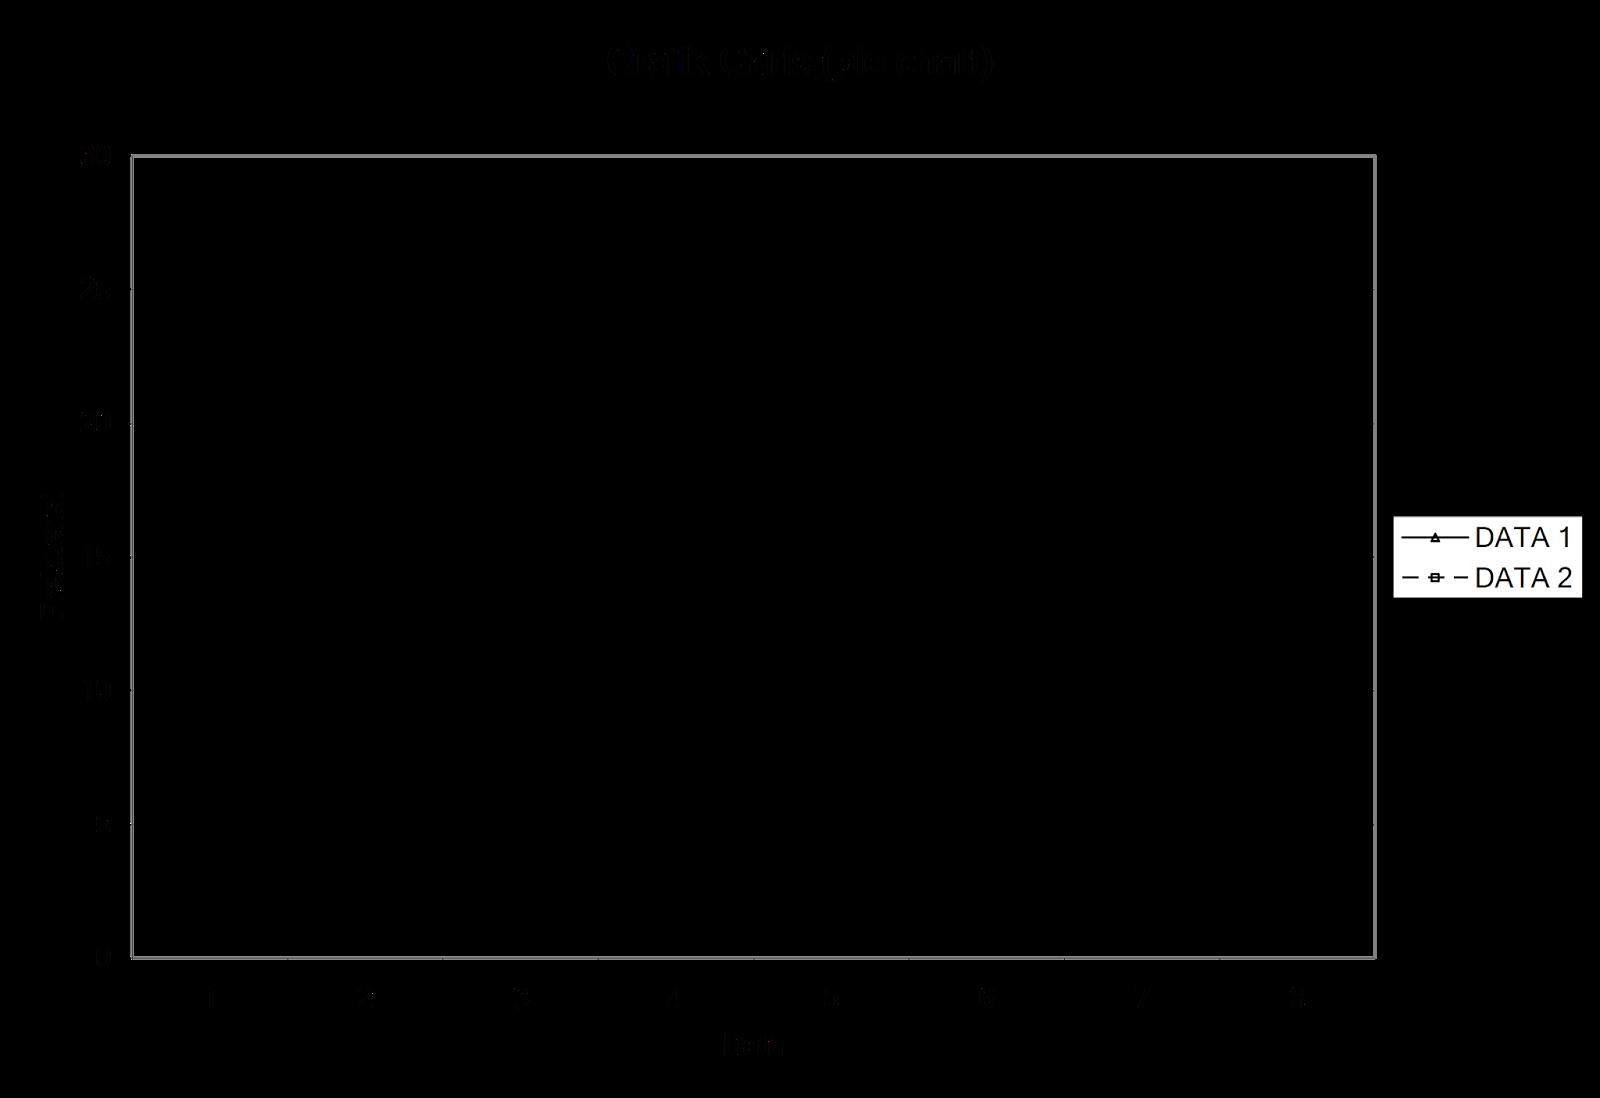 Belajar berbagi penyajian data contoh contoh grafik ccuart Choice Image